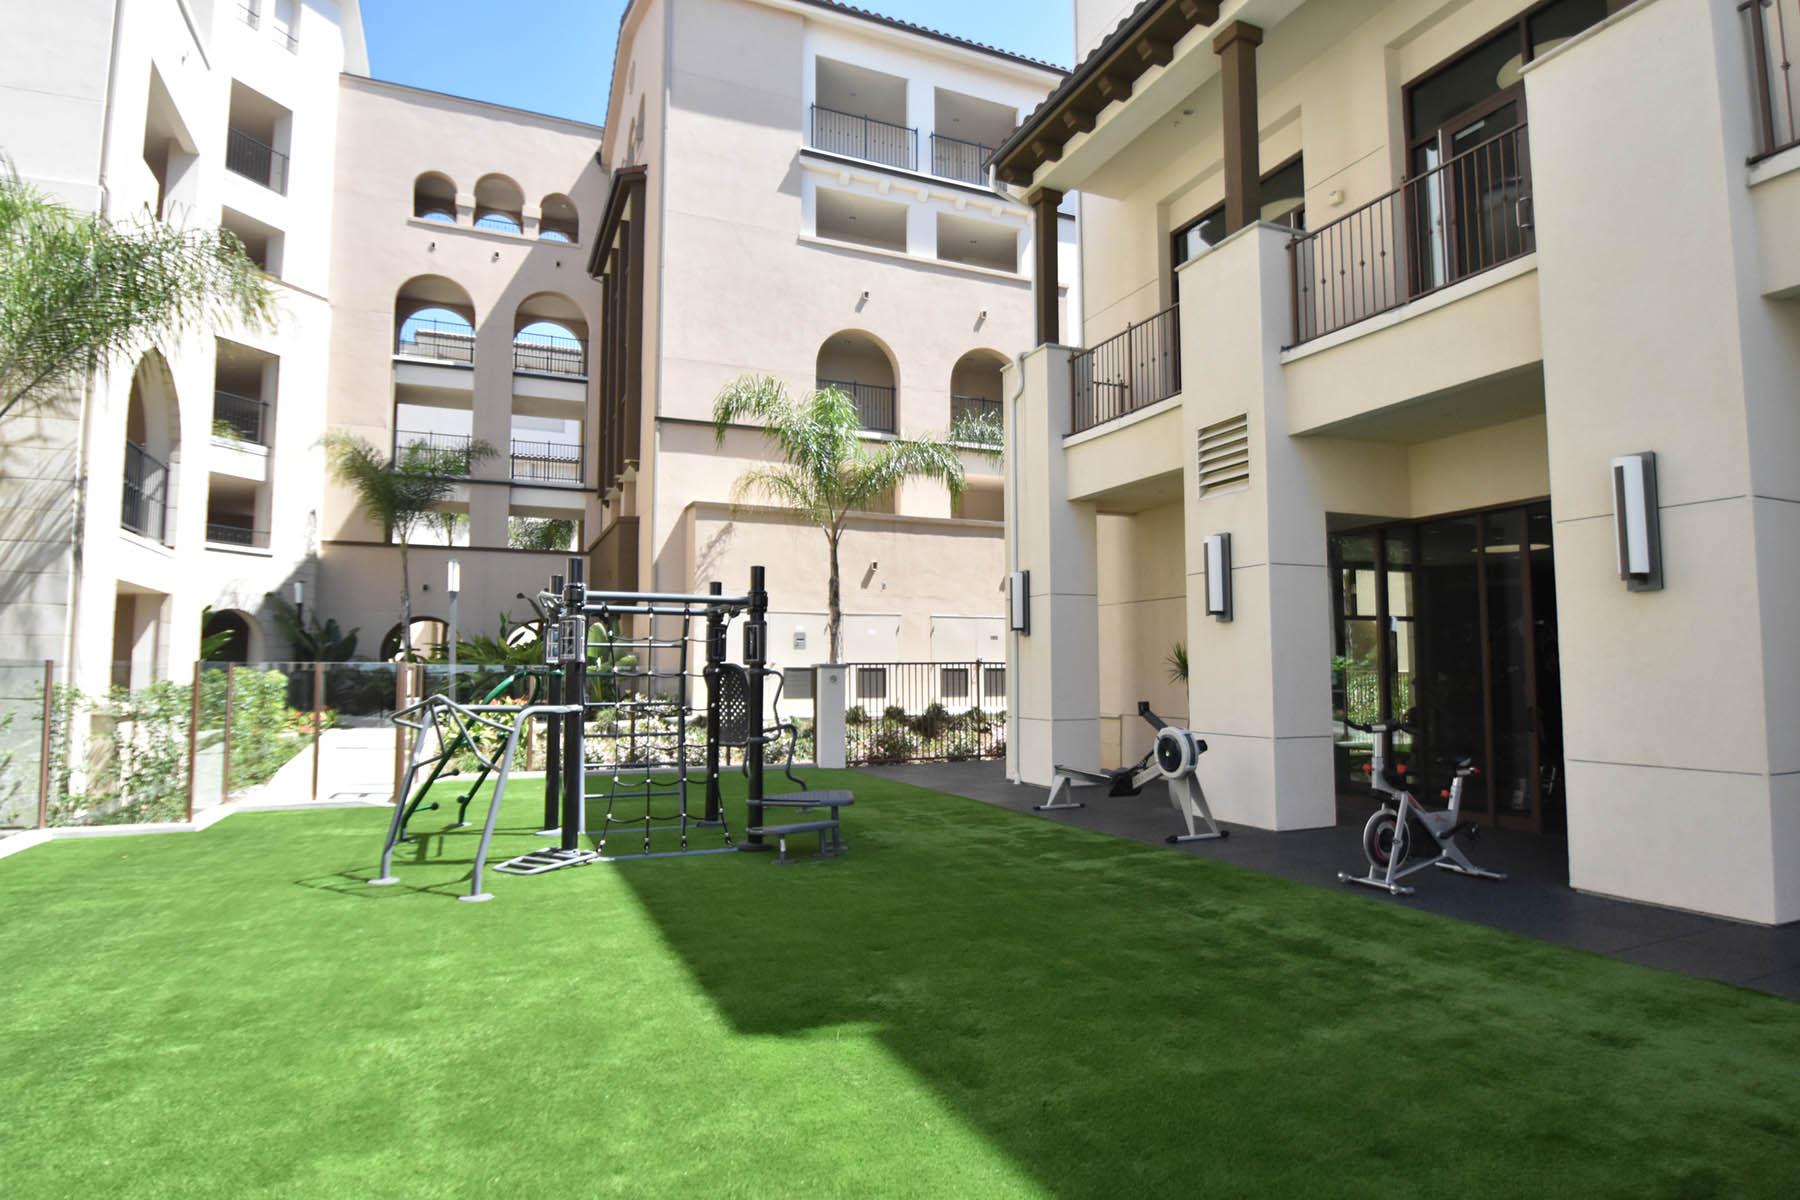 Casa Mira View 1 2 & 3 Bedroom Apartments for Rent in Mira Mesa CA